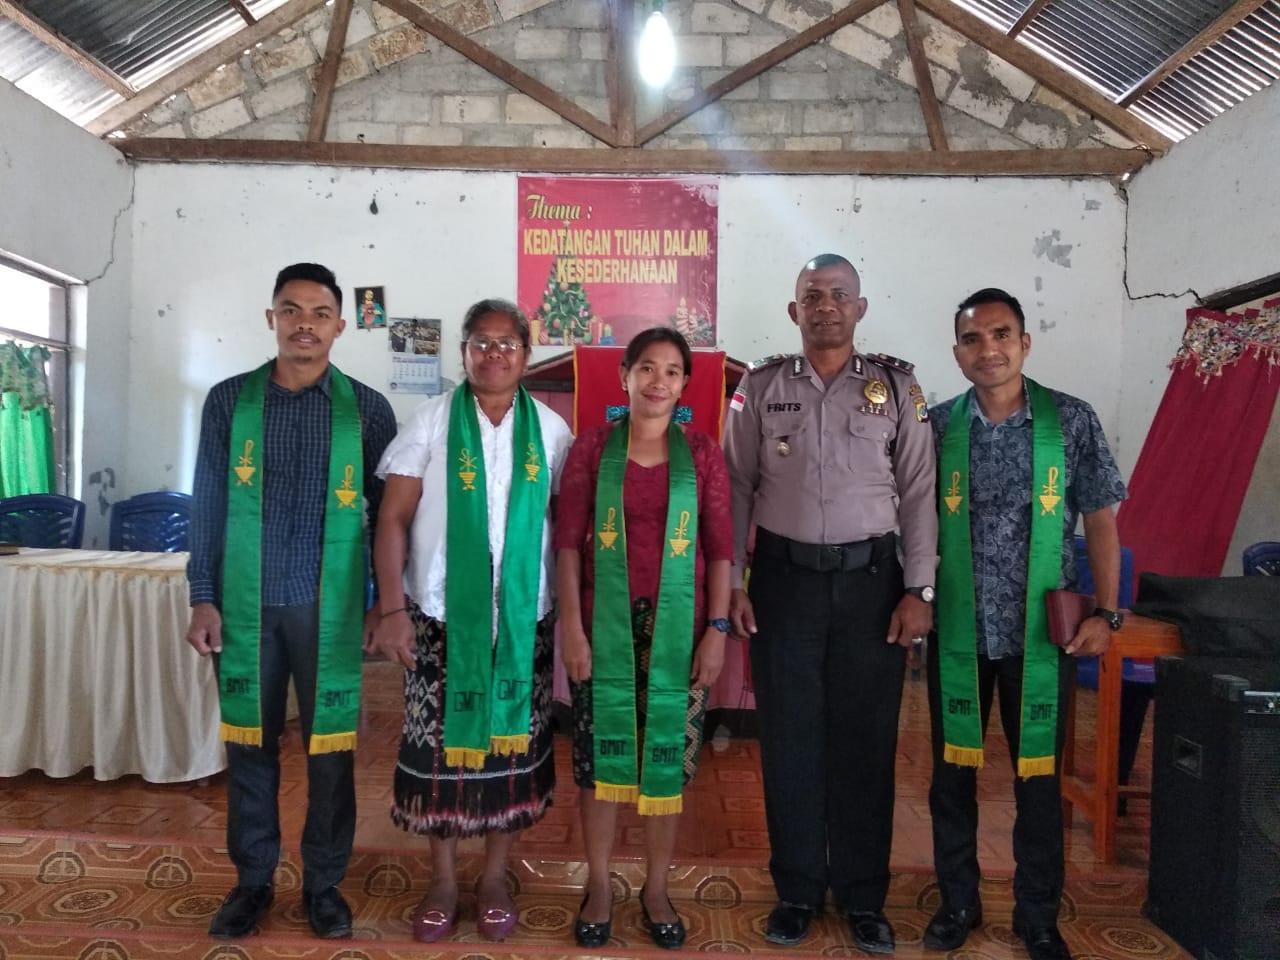 Ciptakan Rasa Aman Dan Nyaman Ibadah Minggu, Polisi Jaga Gereja